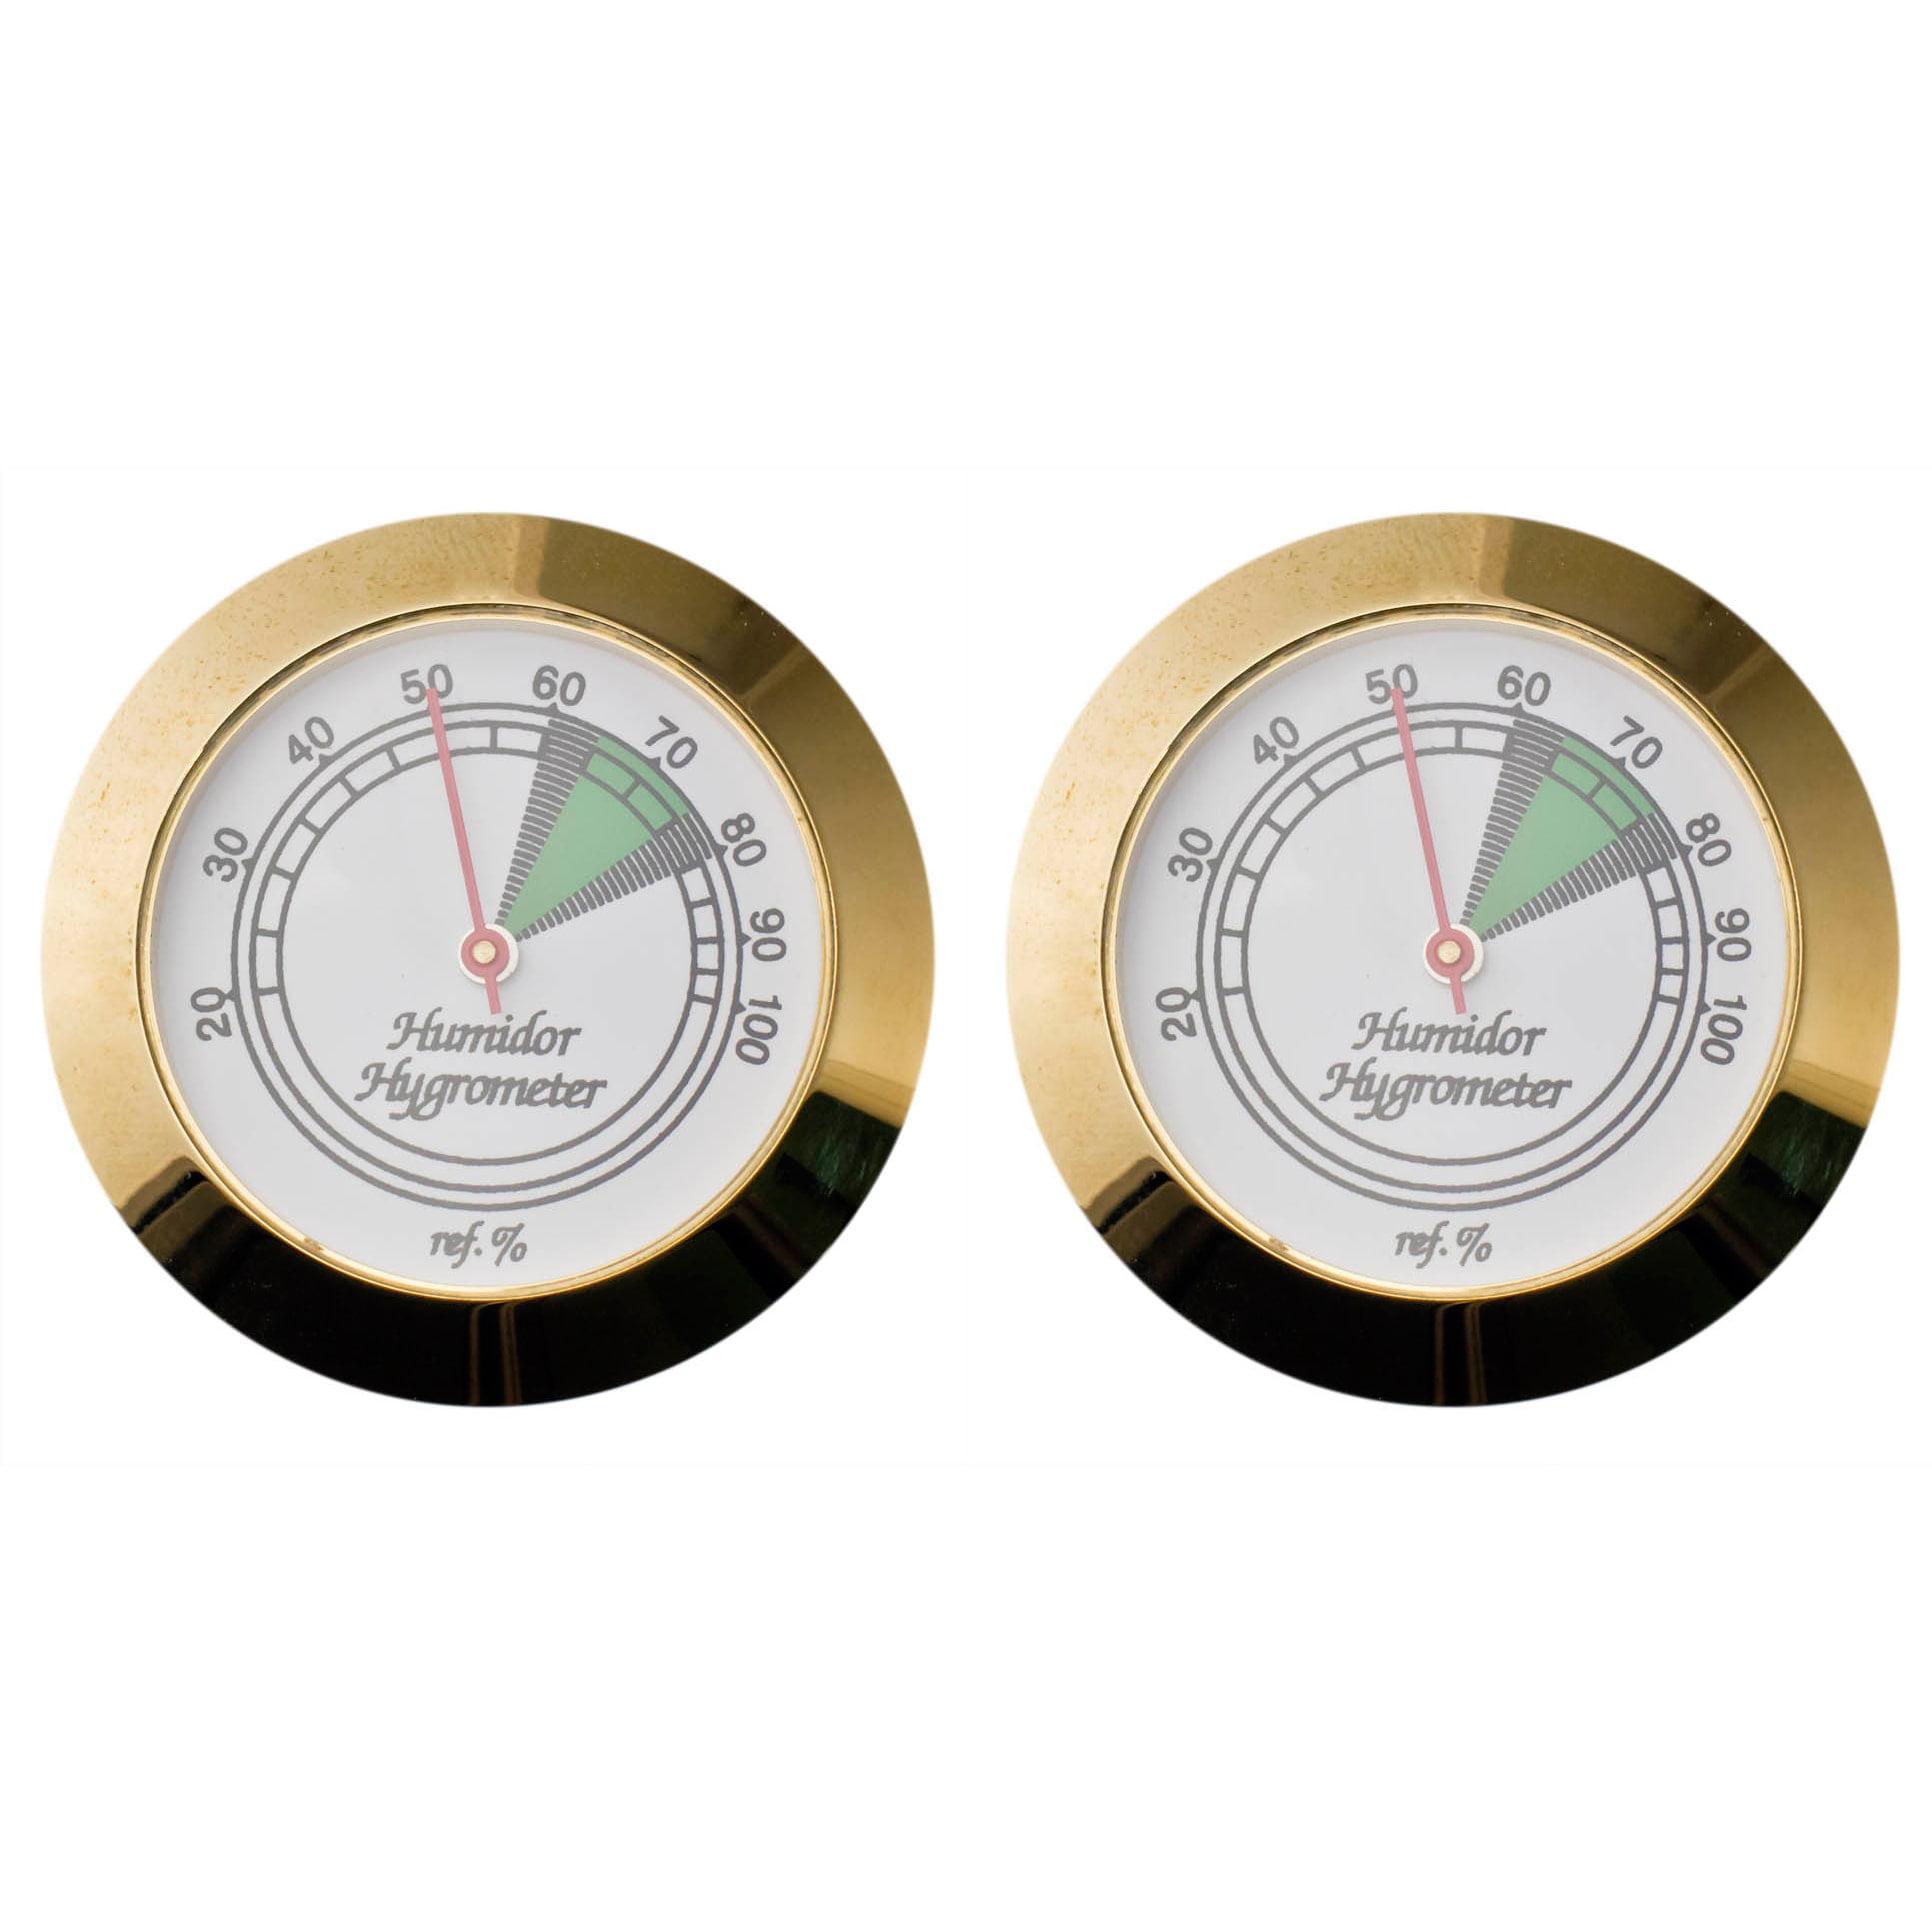 Visol  Goldtone Analog Hygrometer - Pack of Two